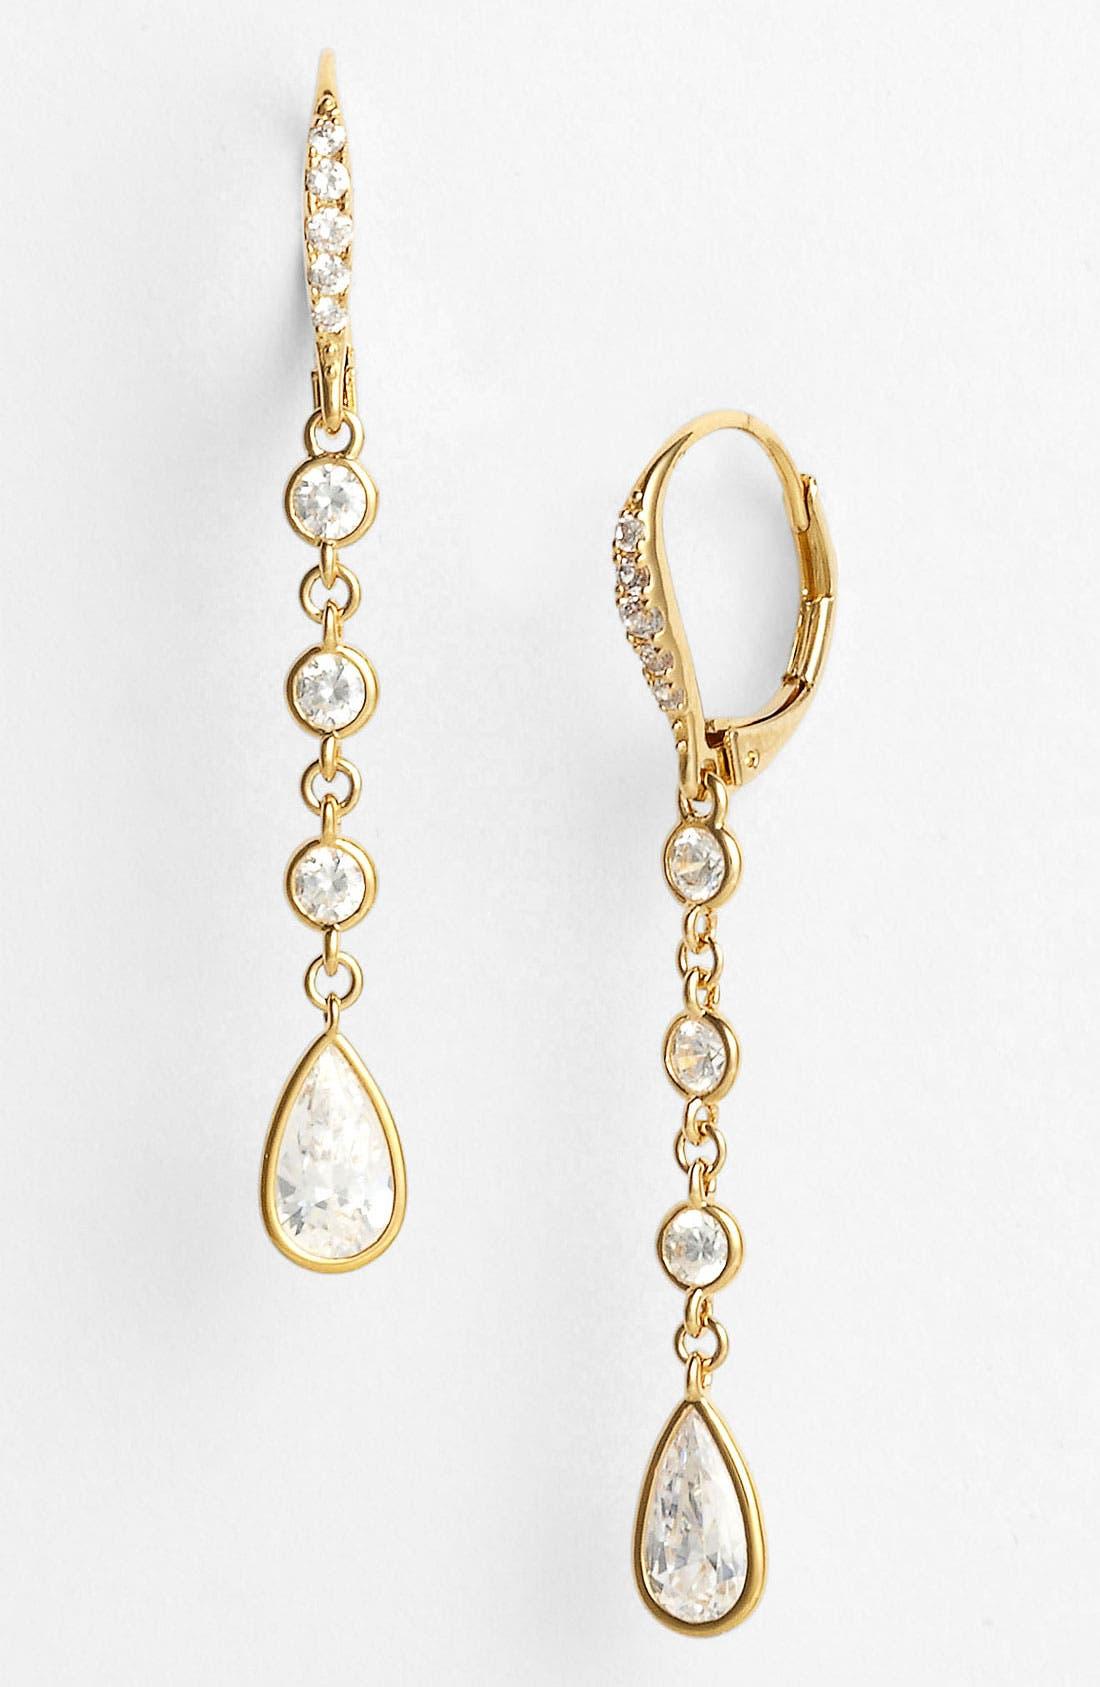 Alternate Image 1 Selected - Nadri Round & Teardrop Cubic Zirconia Earrings (Nordstrom Exclusive)